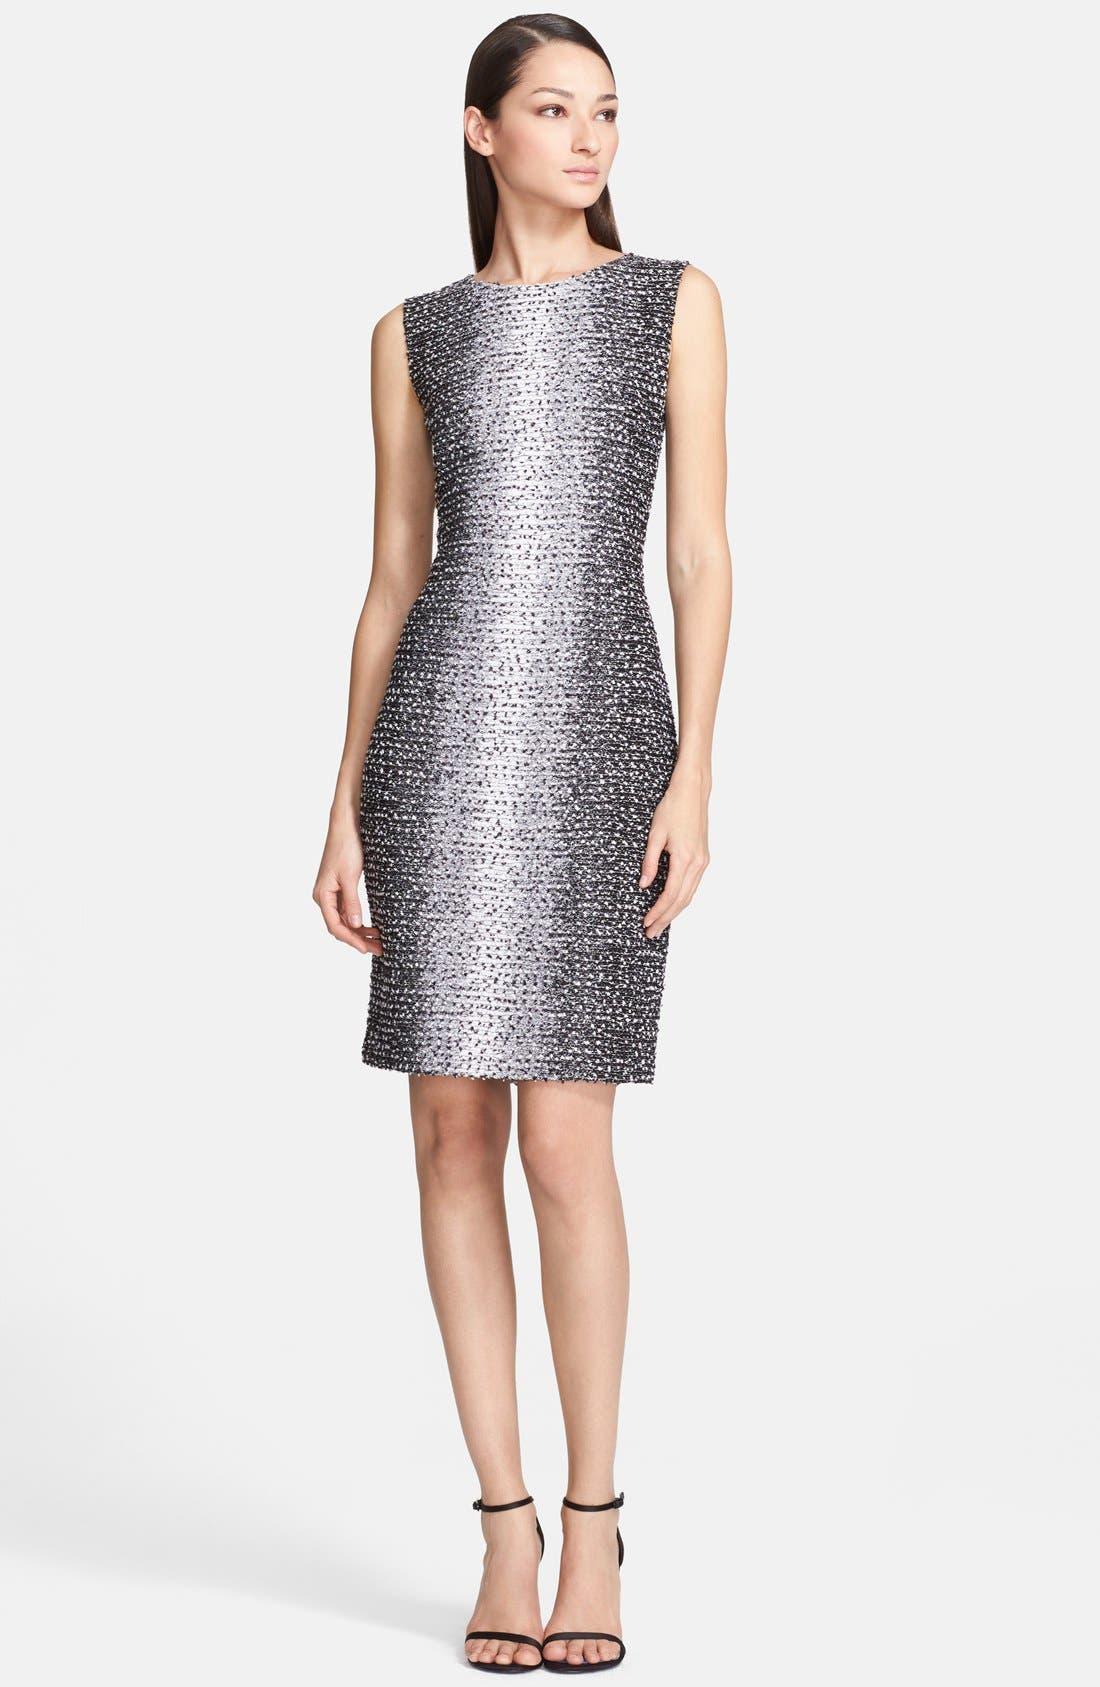 Alternate Image 1 Selected - St. John Collection Ombré Eyelash Knit Sheath Dress